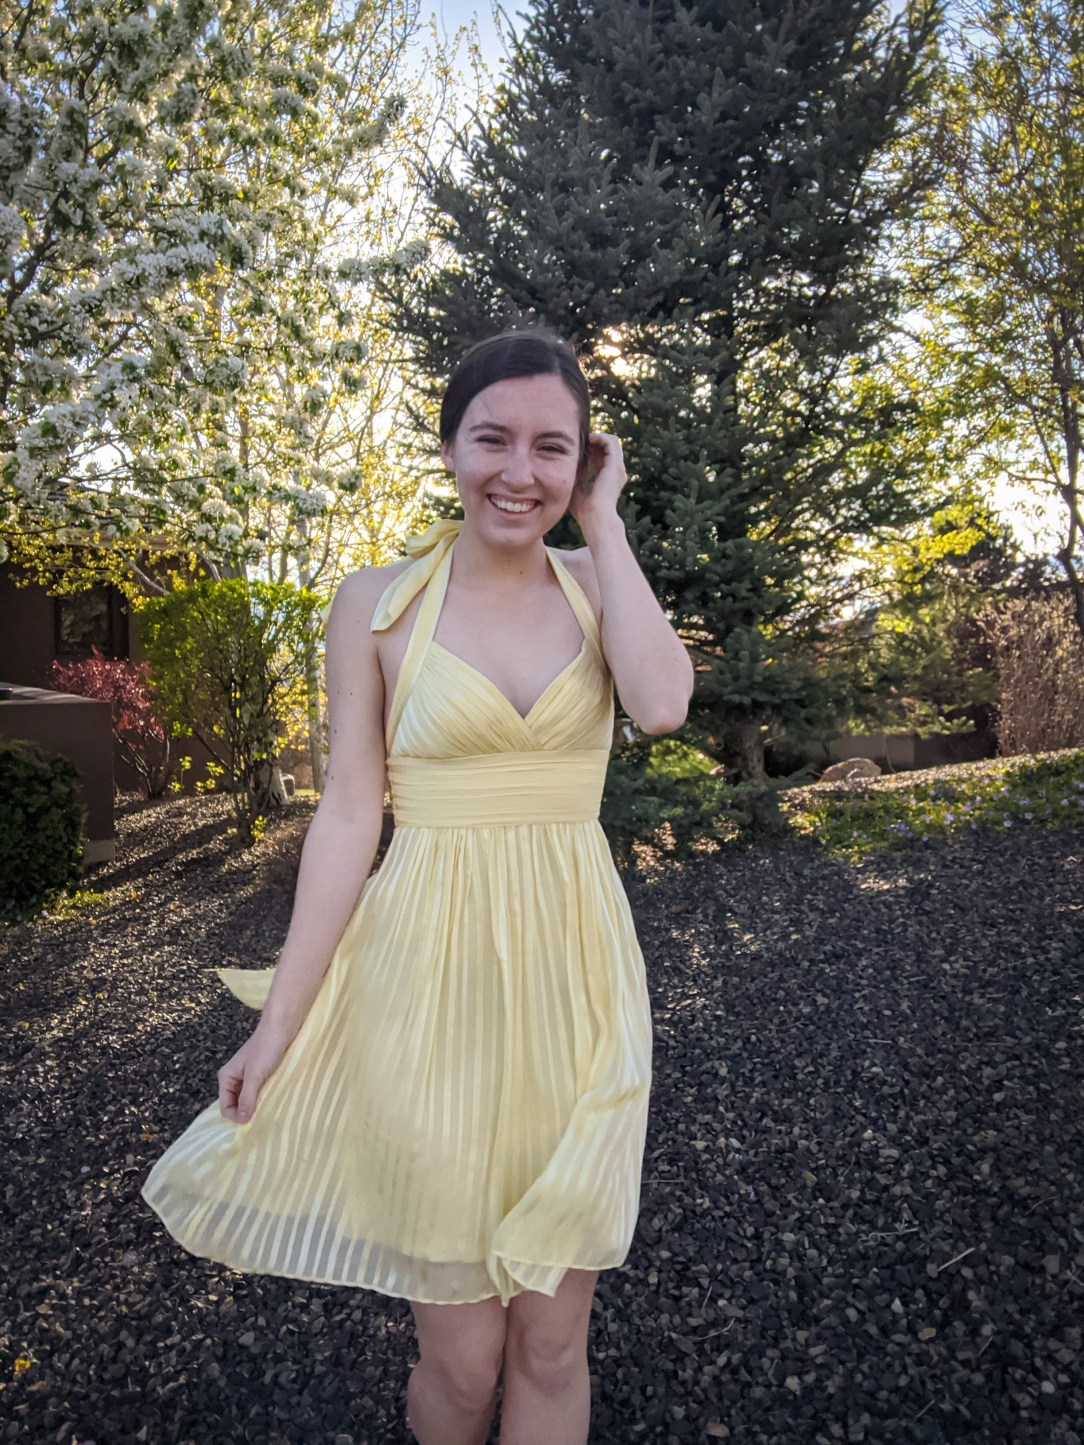 Marilyn Monroe dress, yellow dress, BCBG Max Azria dress, thrift shopping